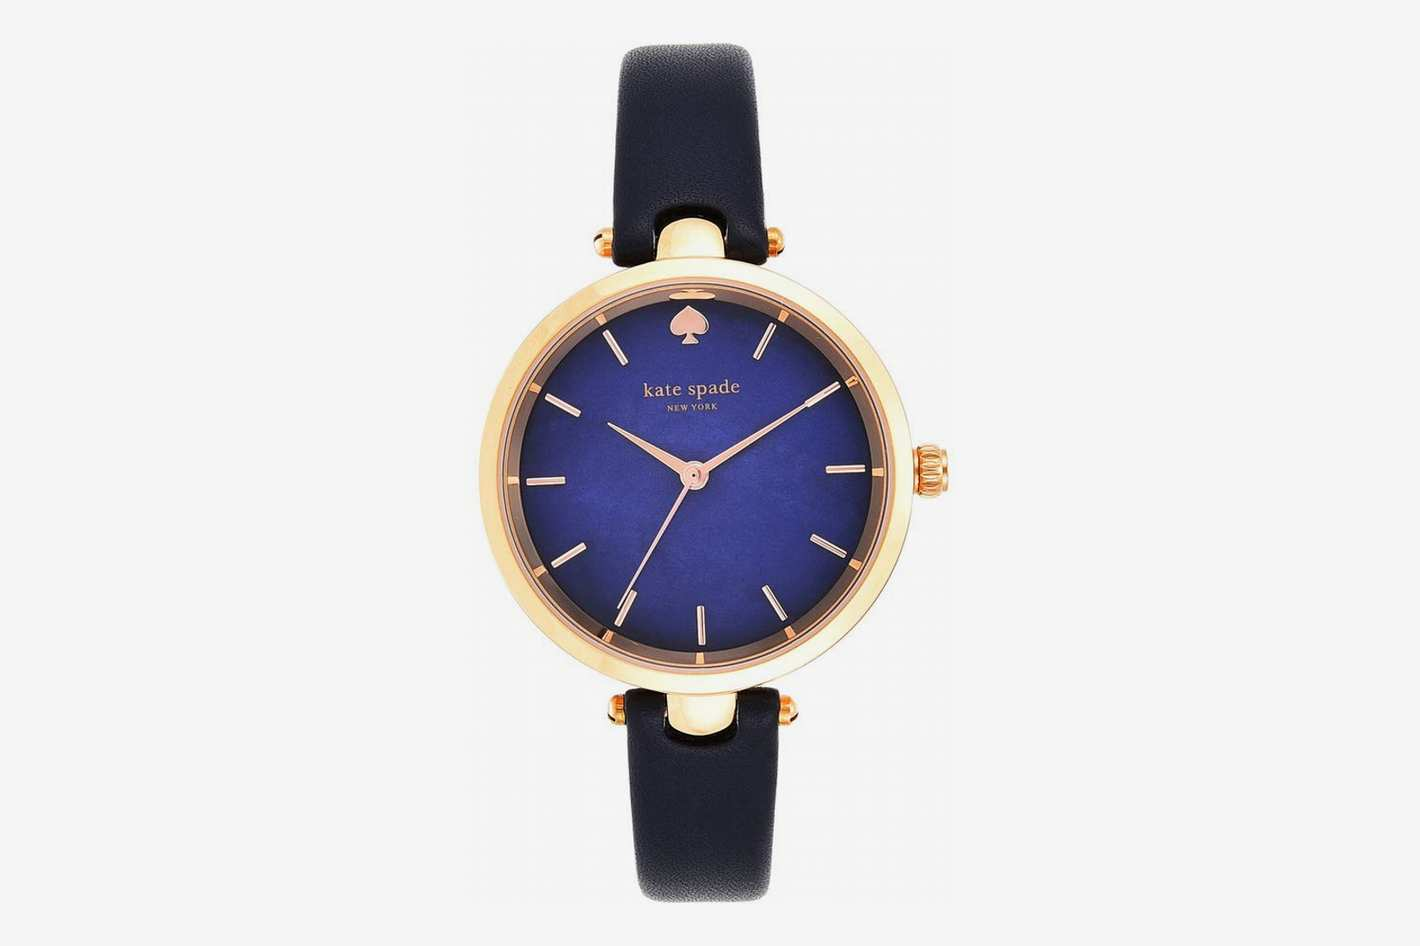 Kate Spade New York Holland Wrist Watch